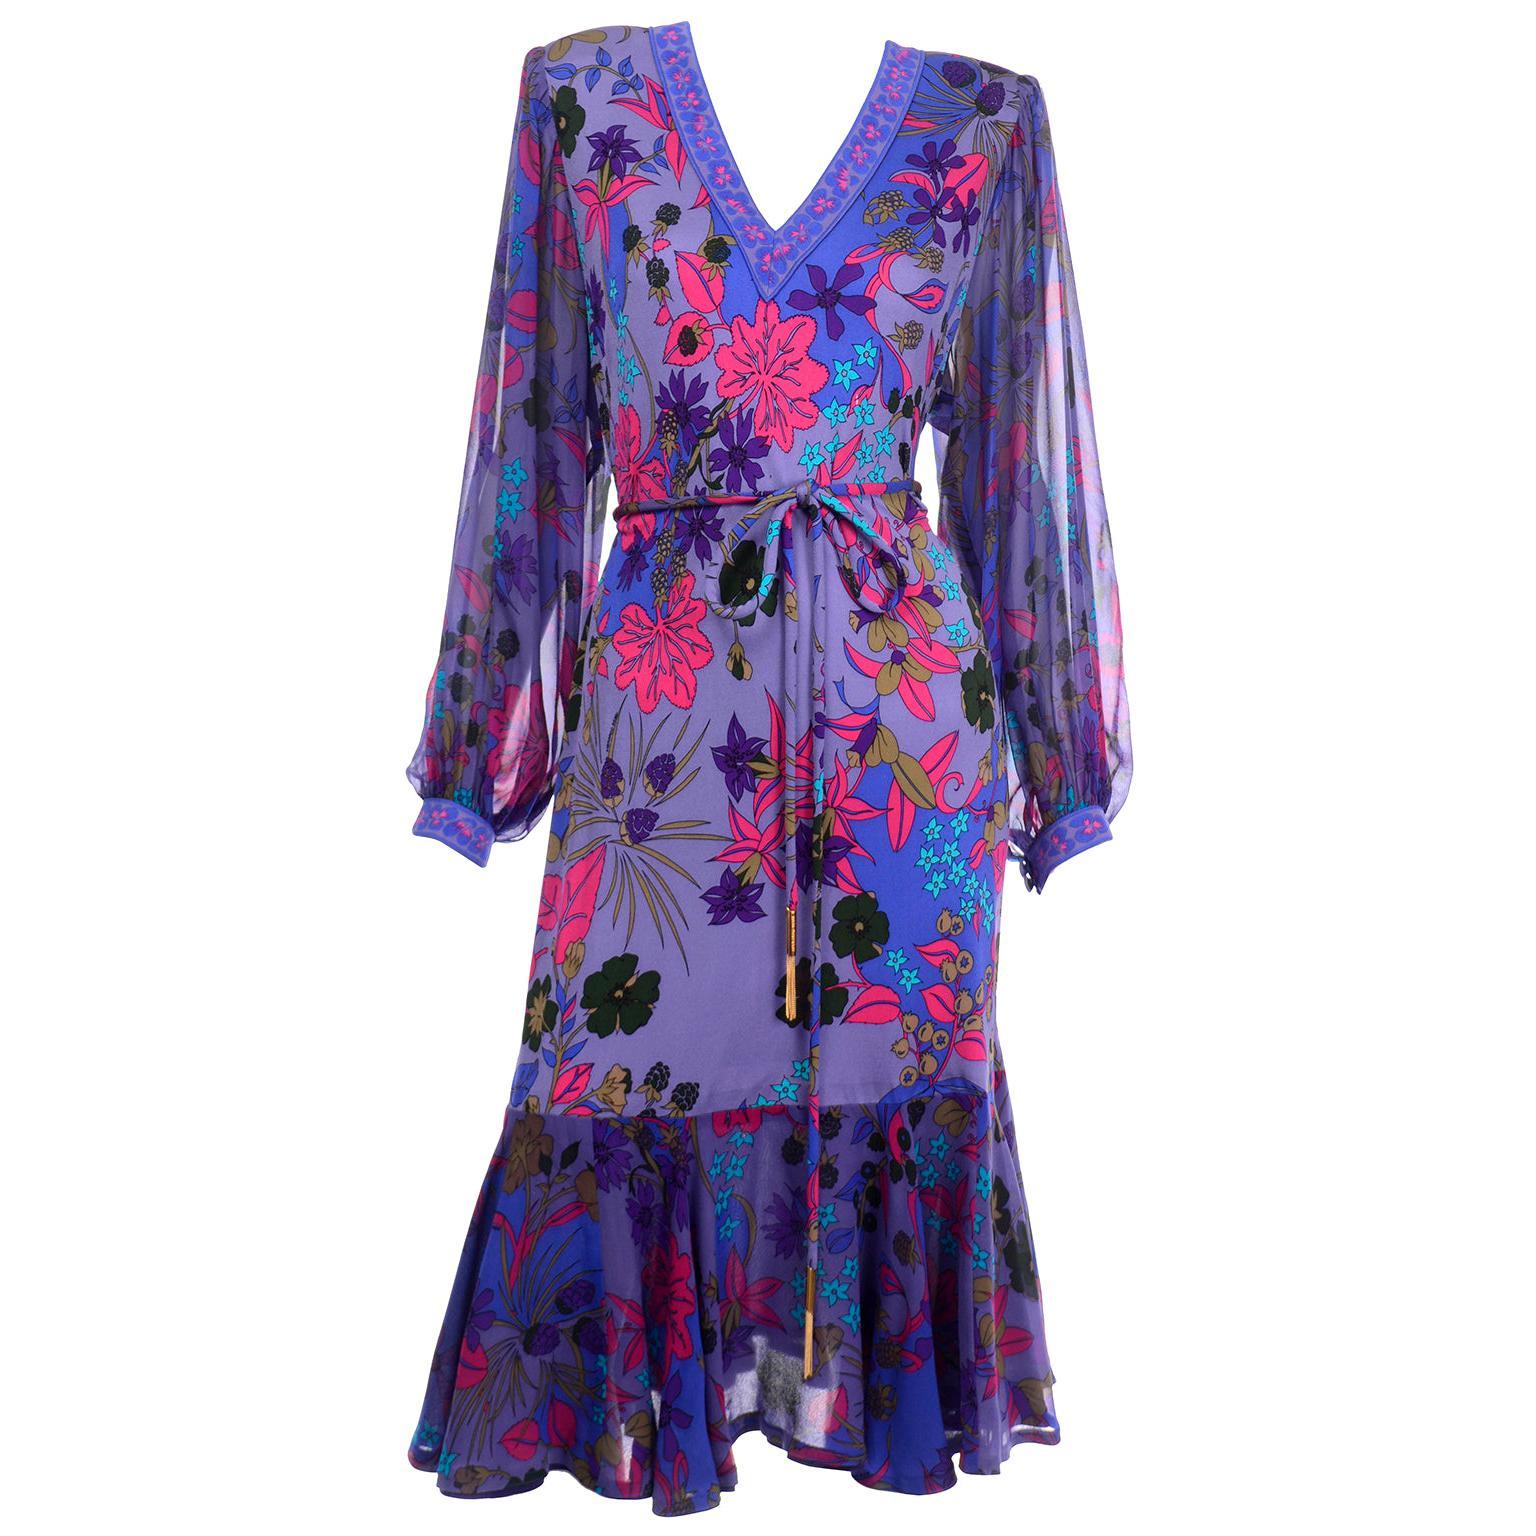 Averardo Bessi Italy Vintage Purple Floral Silk Jersey Dress With Belt